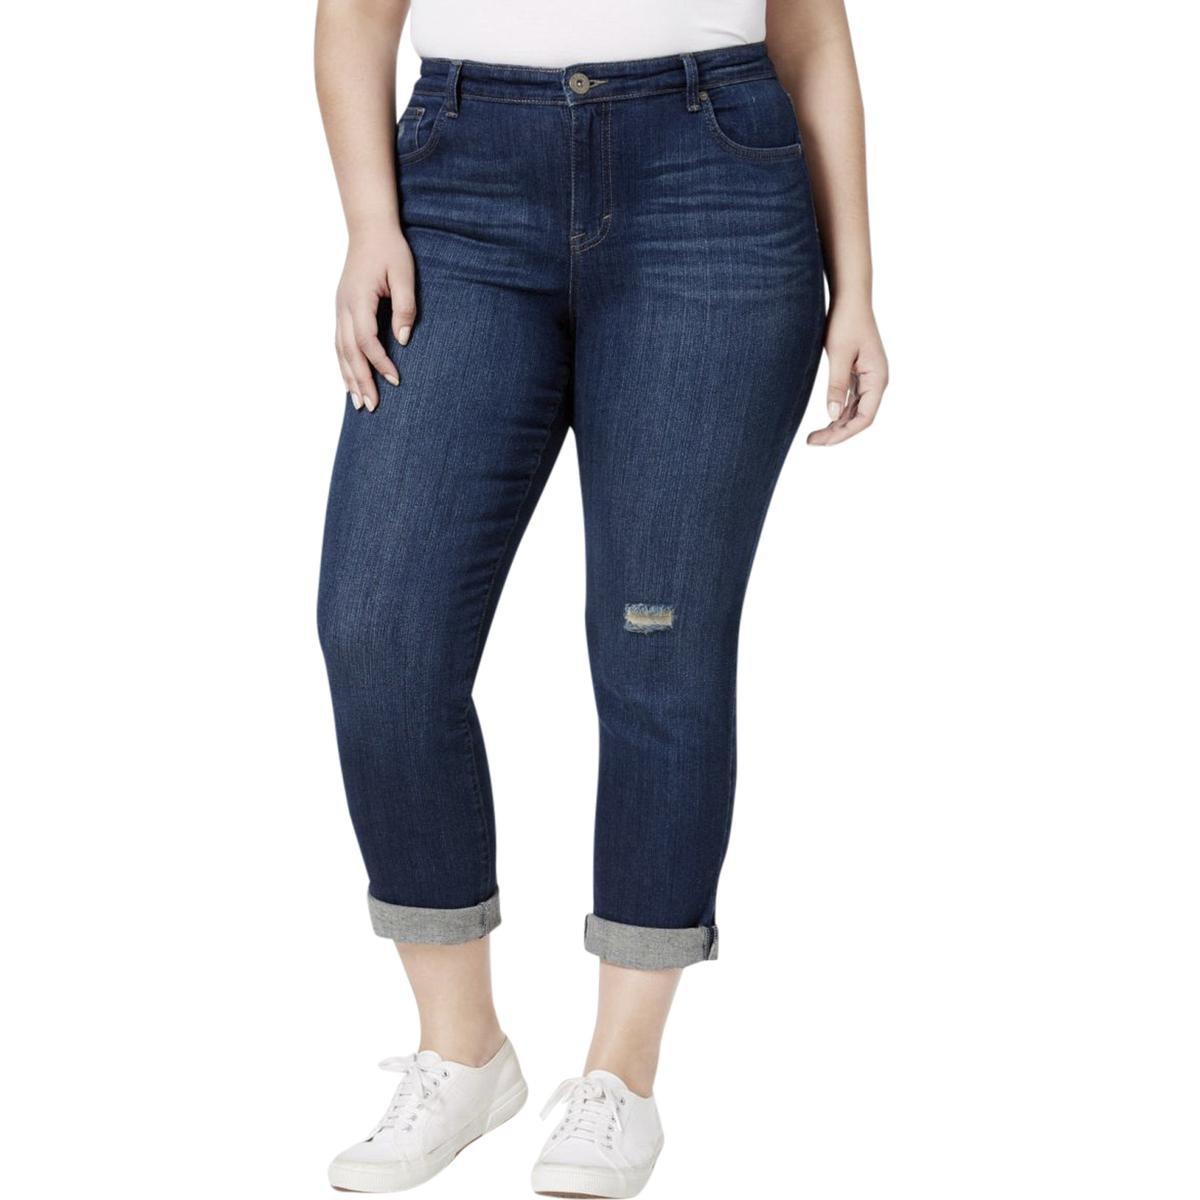 Style & Co. Womens Plus Denim Distressed Boyfriend Jeans Blue 24W